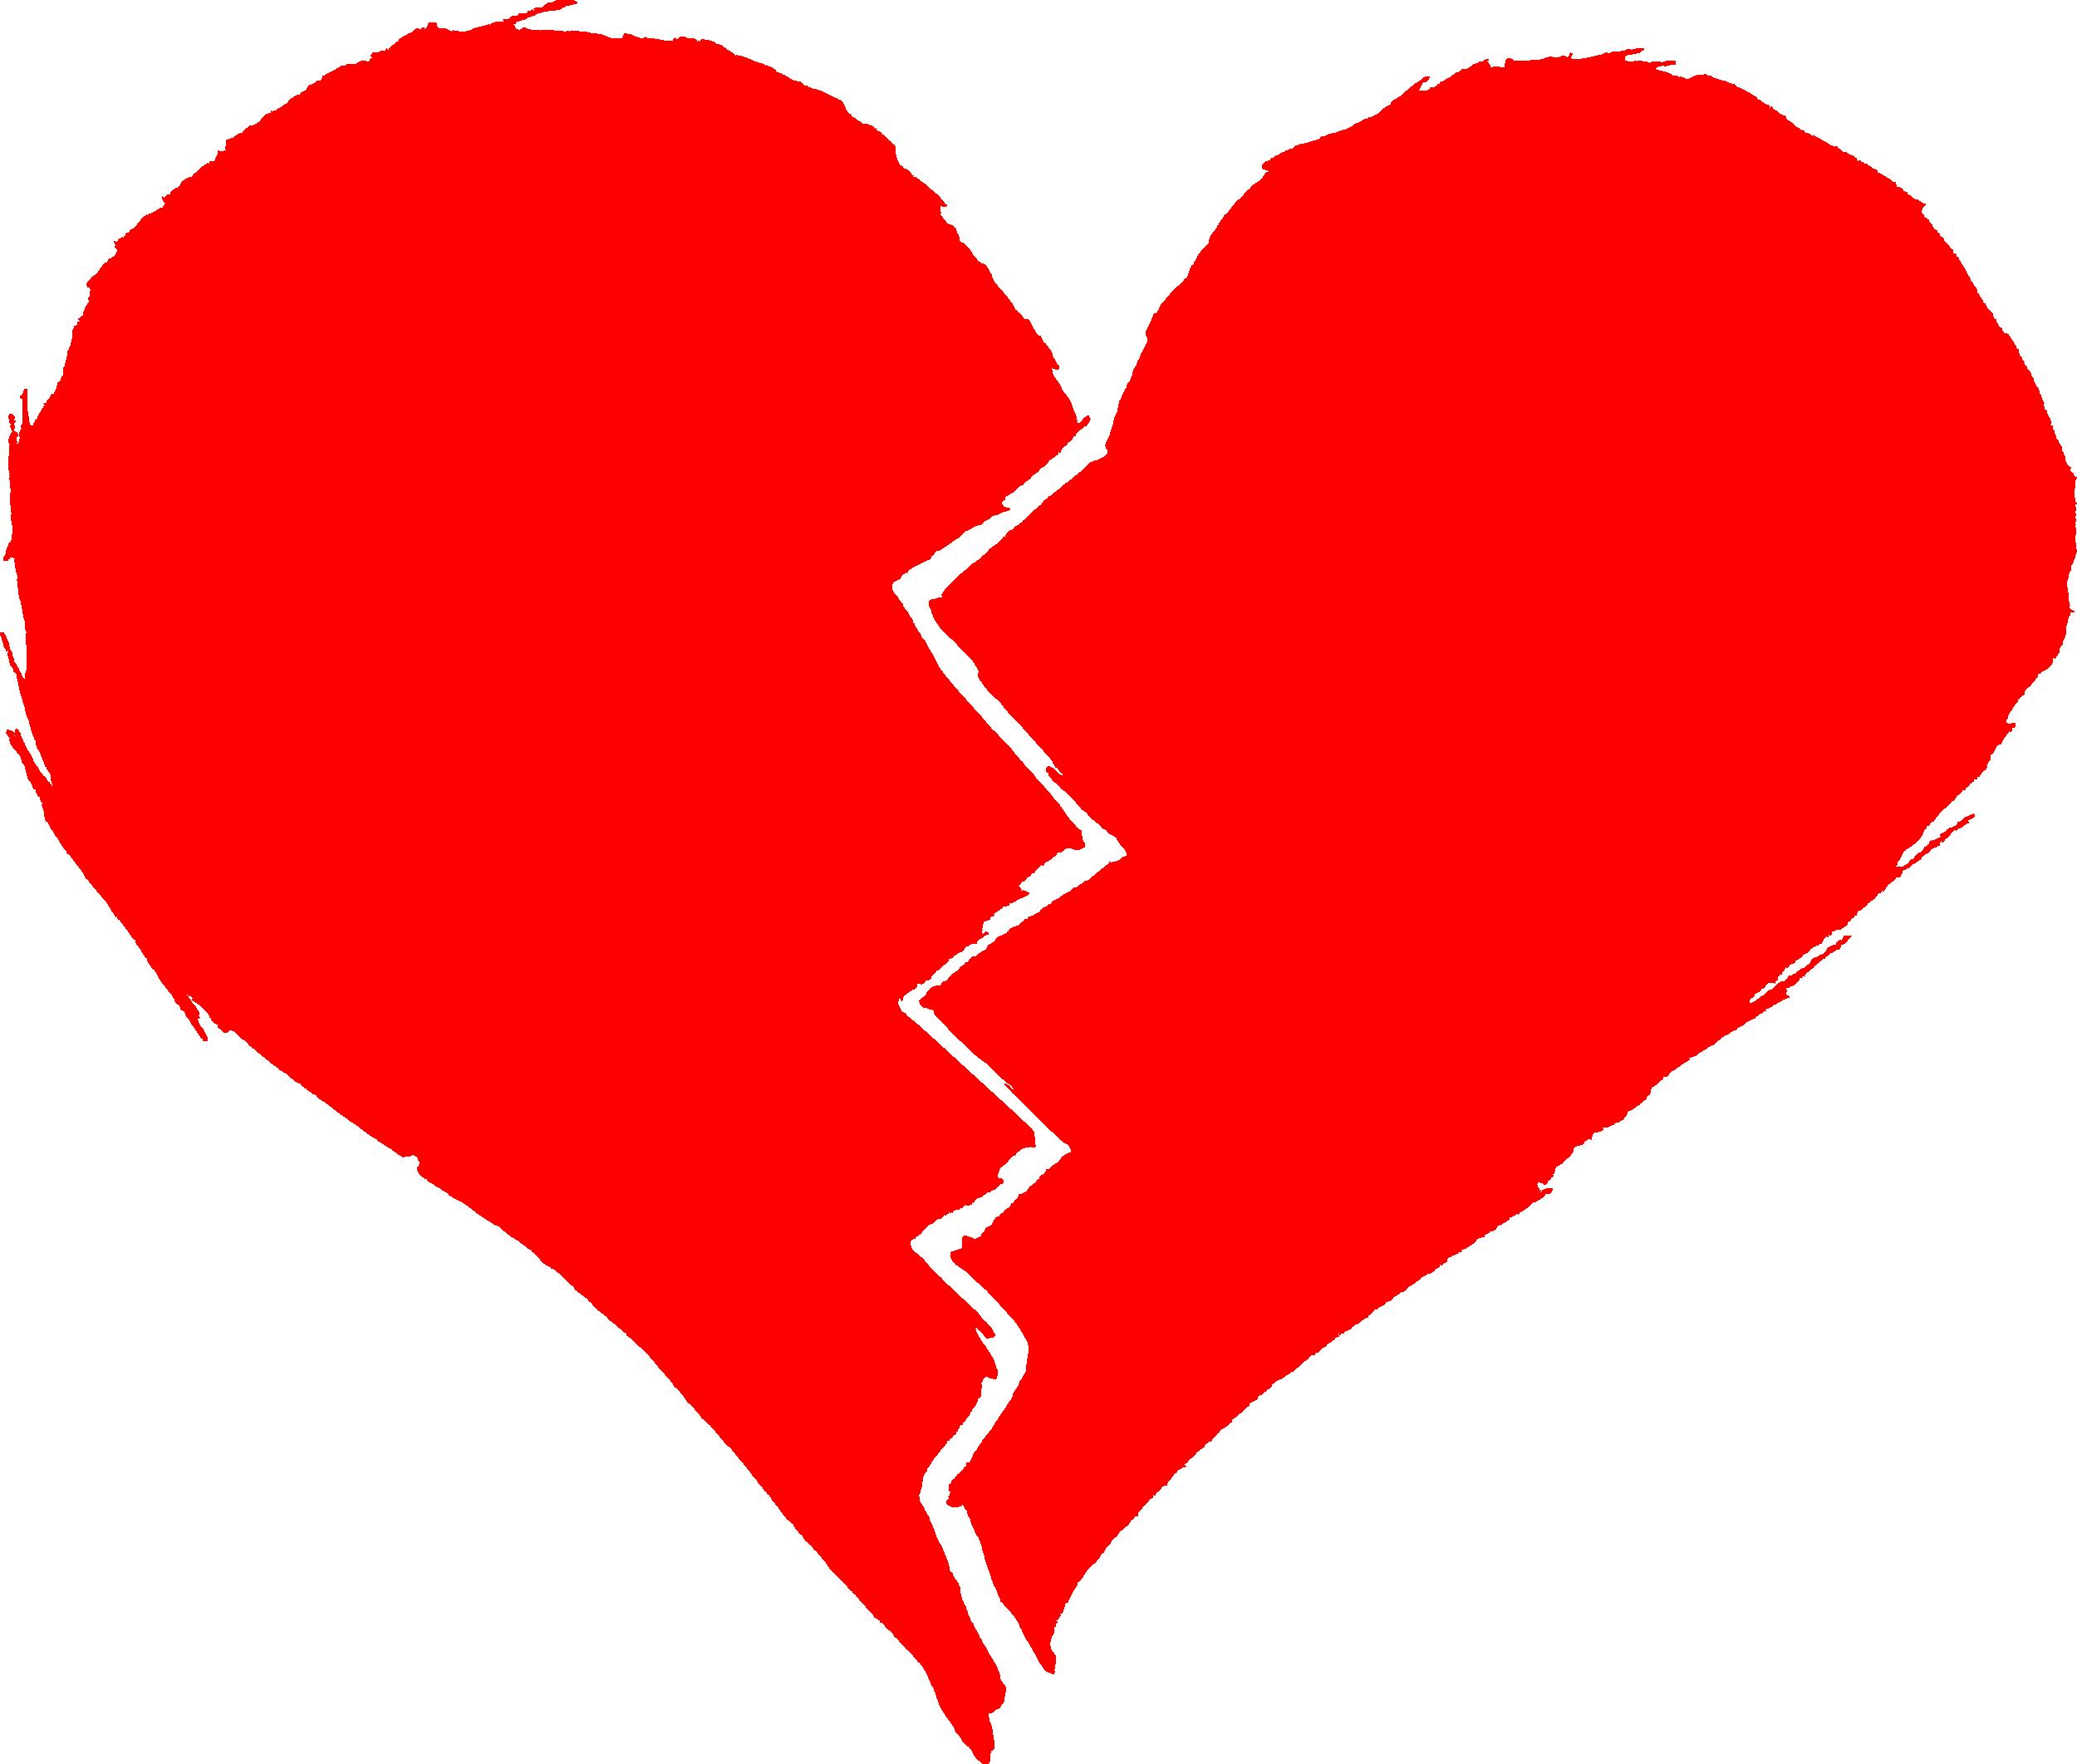 Broken Heart Transparent Background #45701.